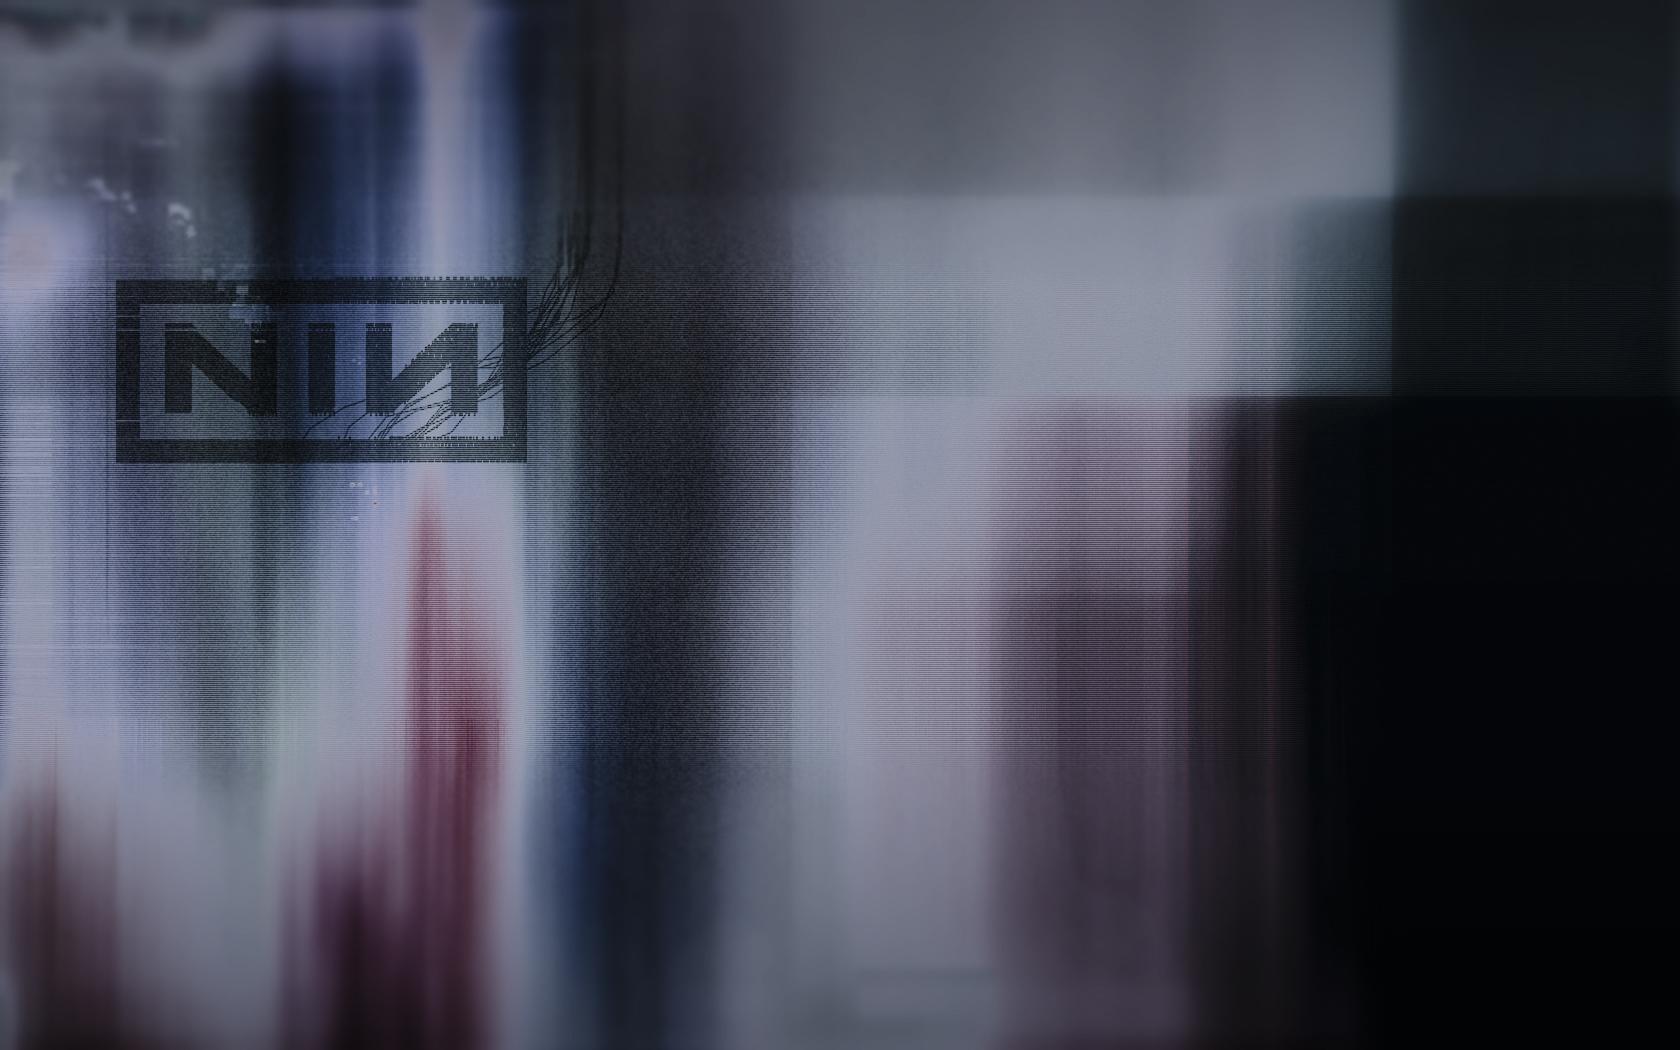 Free Download Nine Inch Nails Nine Inch Nails Wallpaper